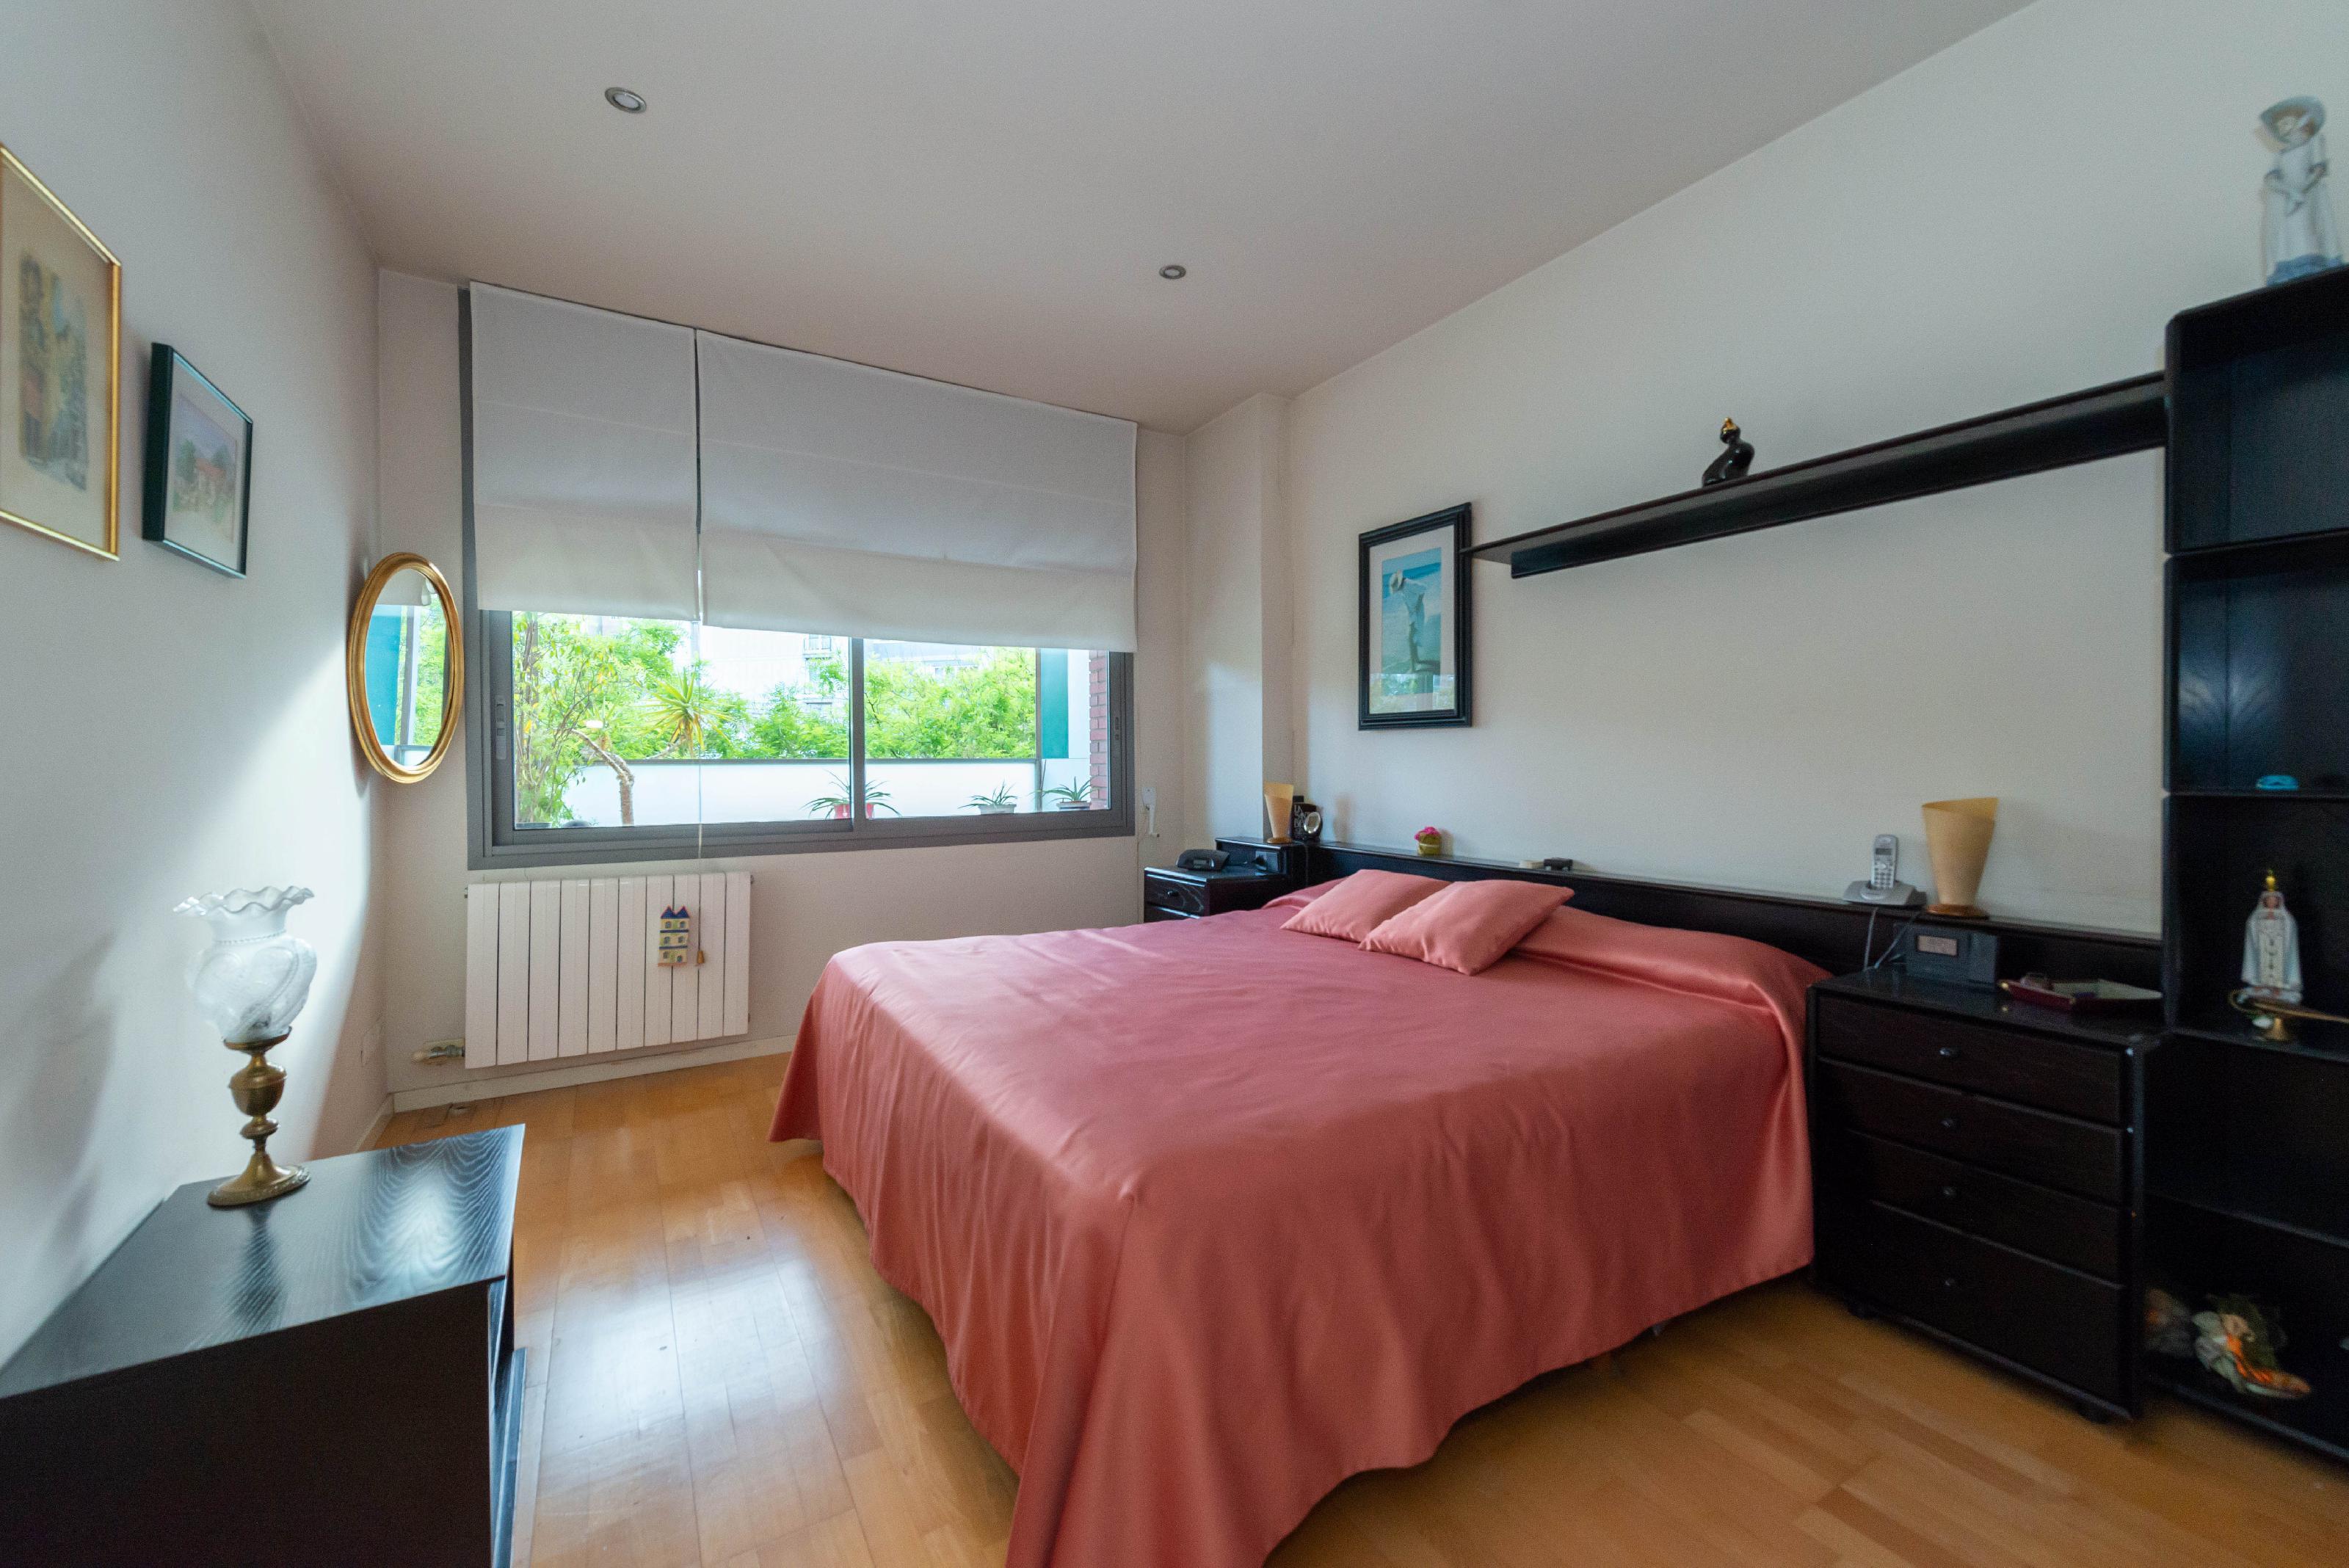 246281 Flat for sale in Sarrià-Sant Gervasi, Tres Torres 16